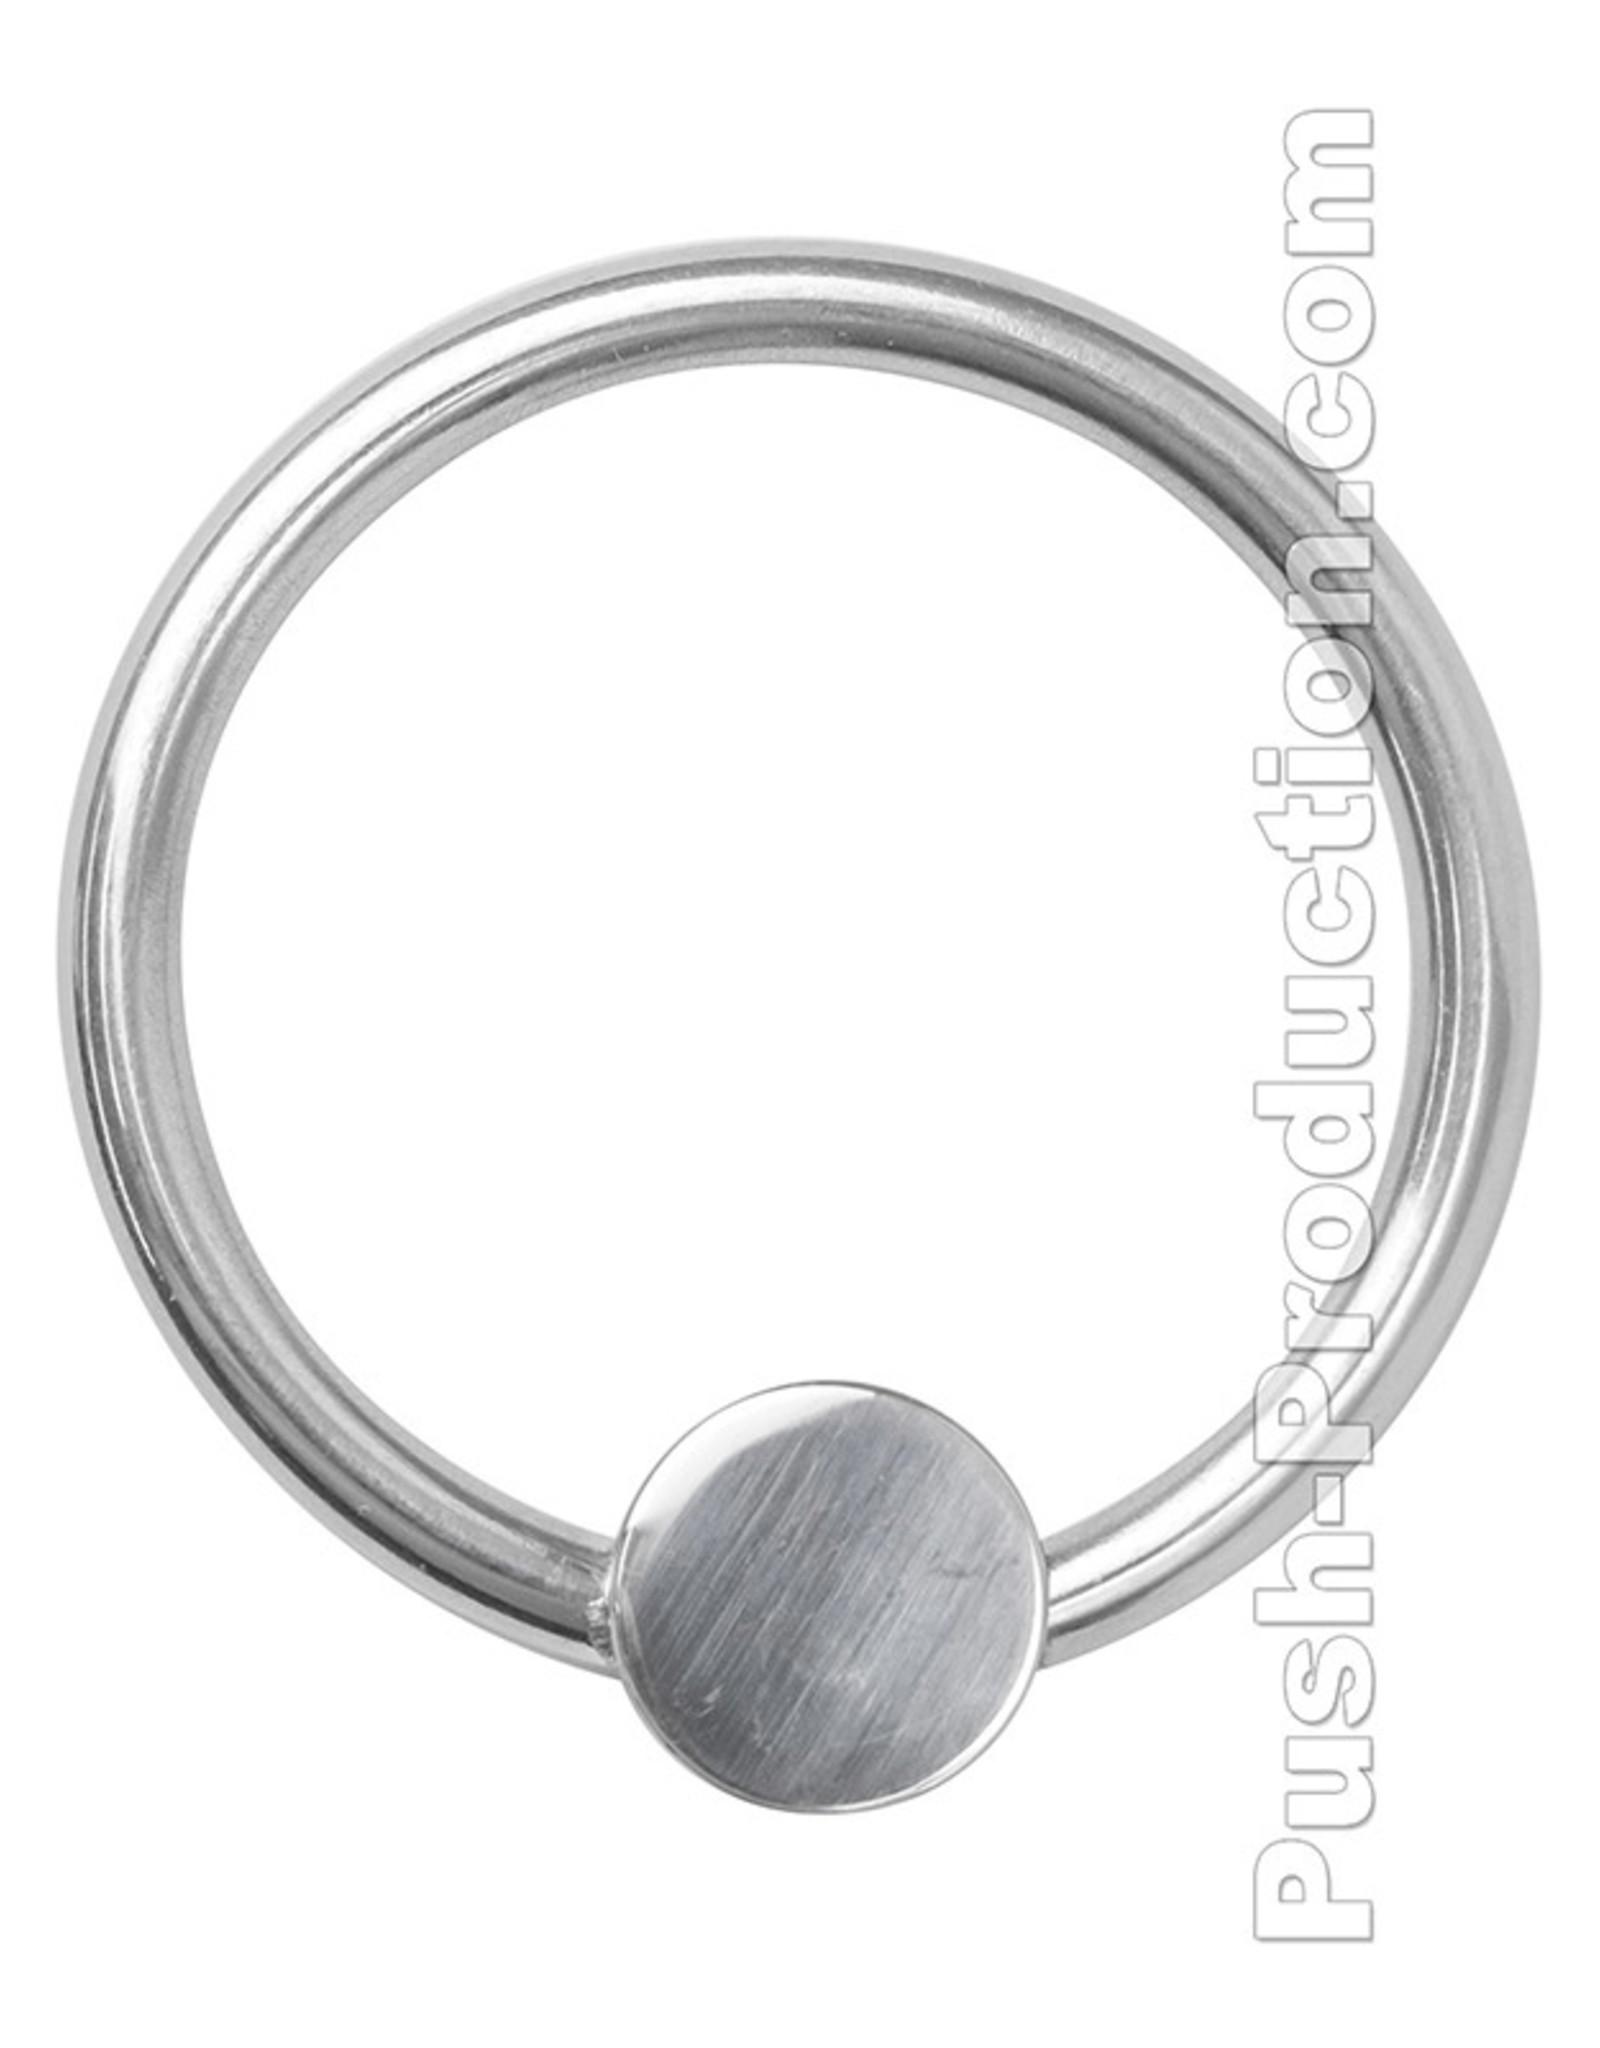 Push Steel - Pressure Plate Glans anneau de gland